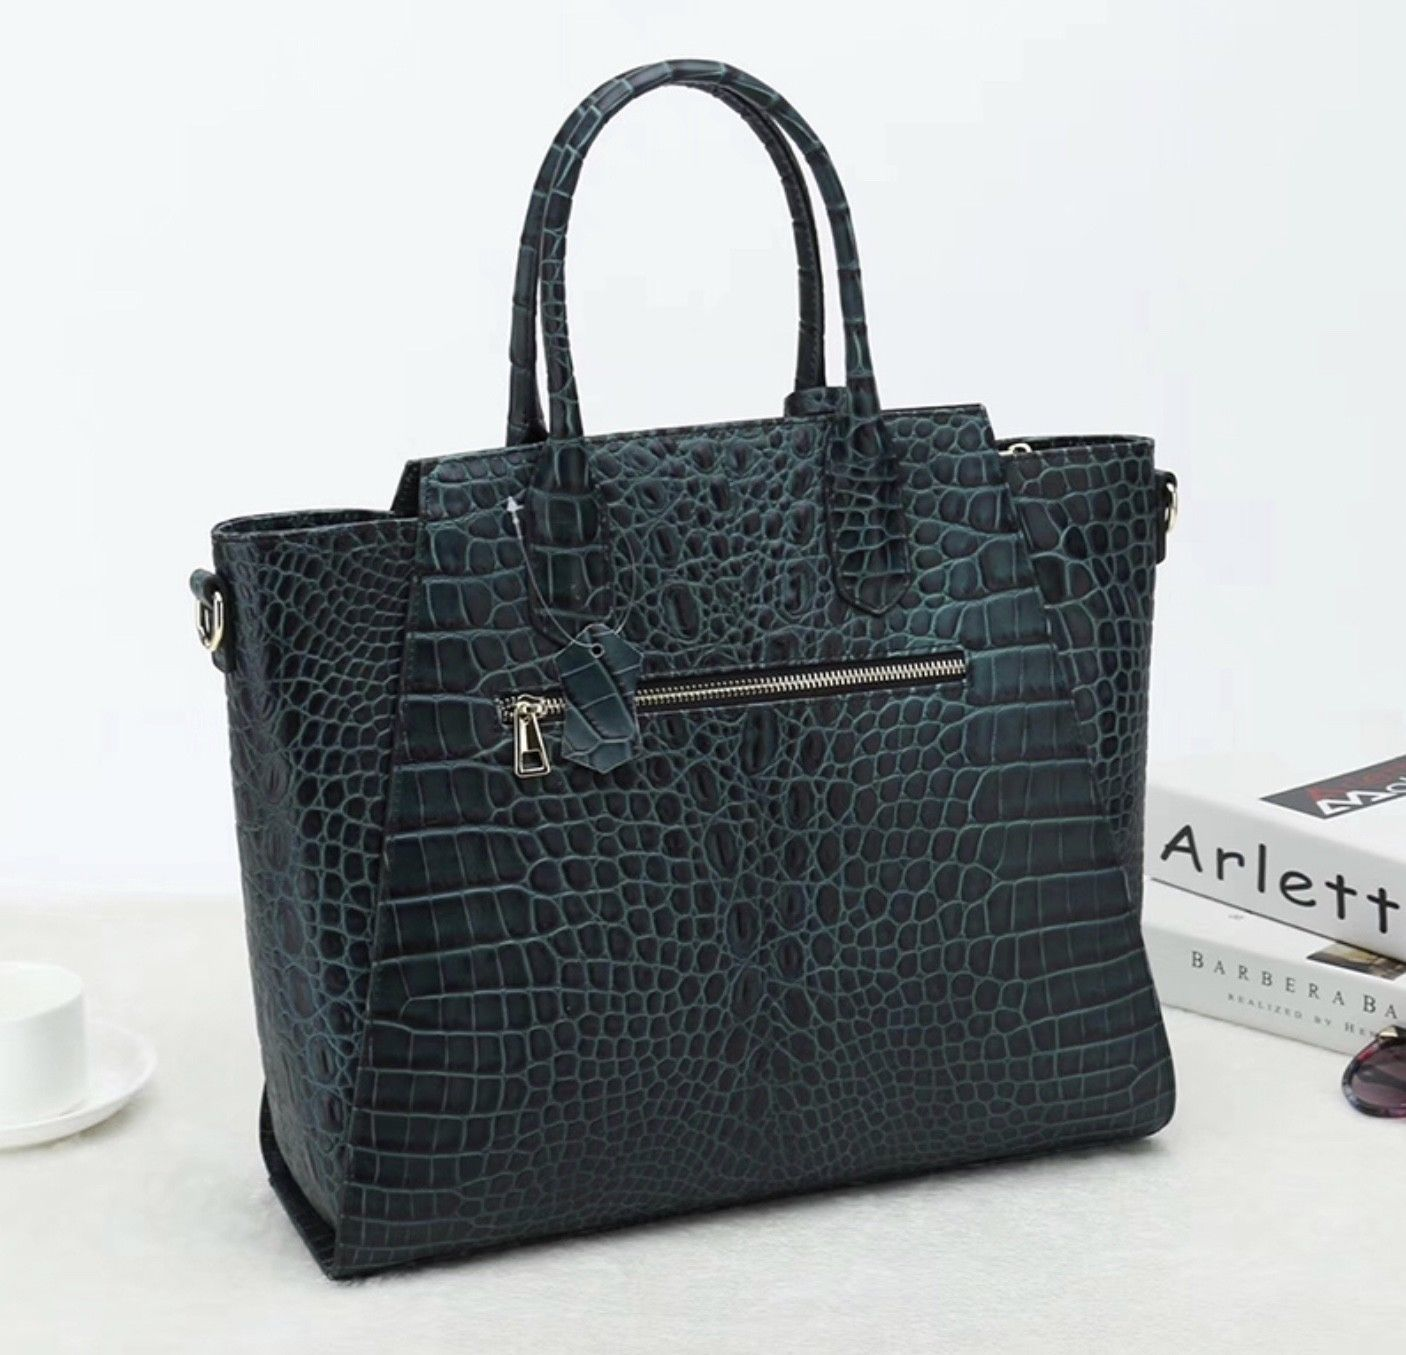 New Python Snake Pattern Italian Leather Winged Satchel Handbag Purse 2651S